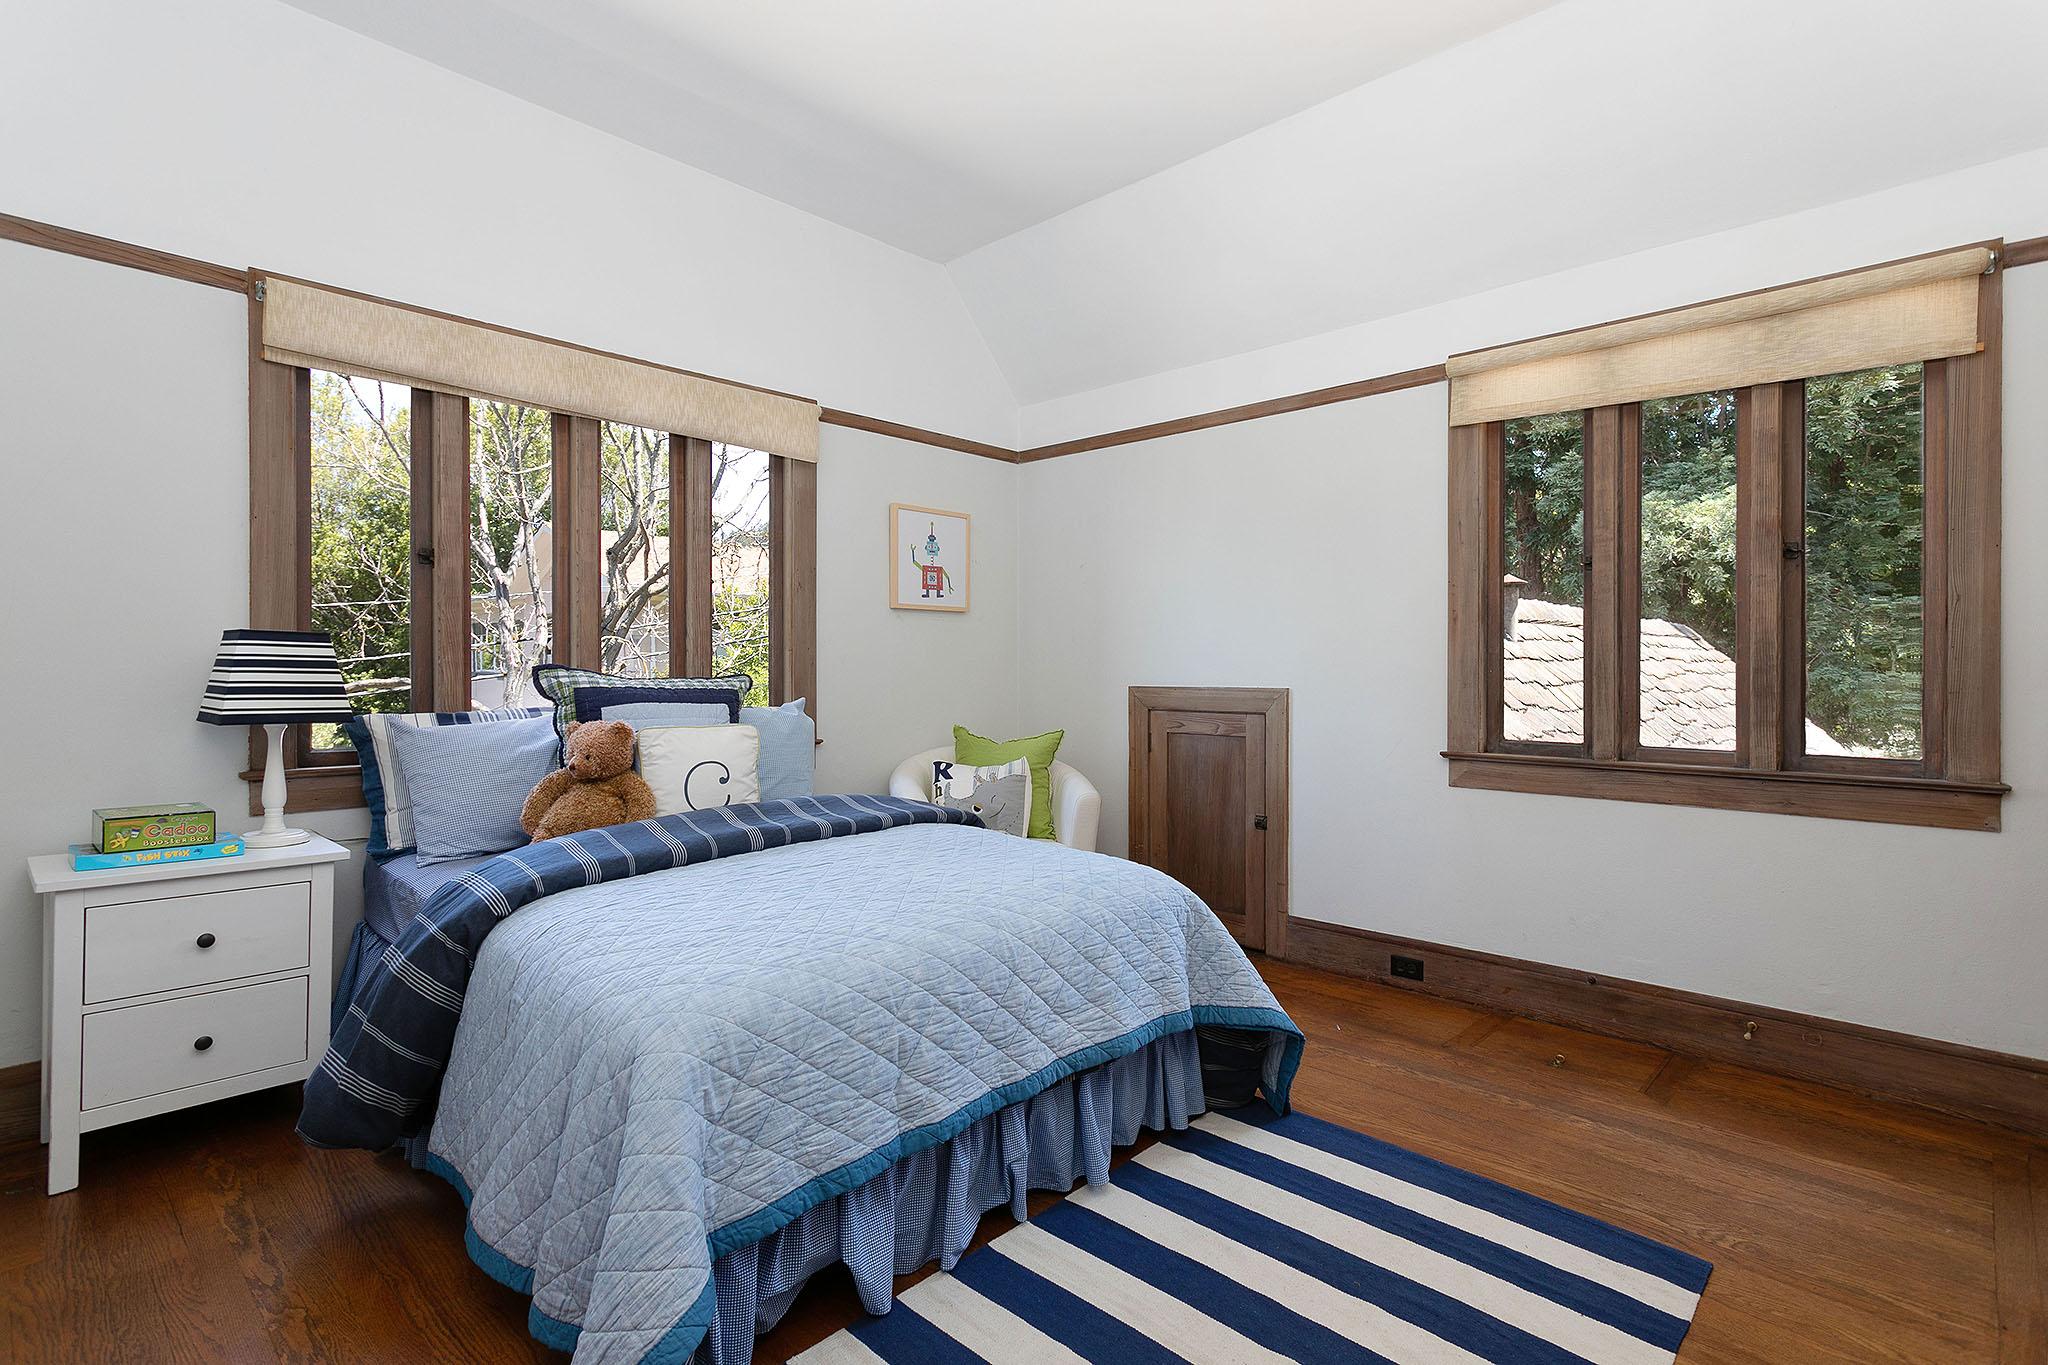 c new bed2.jpg